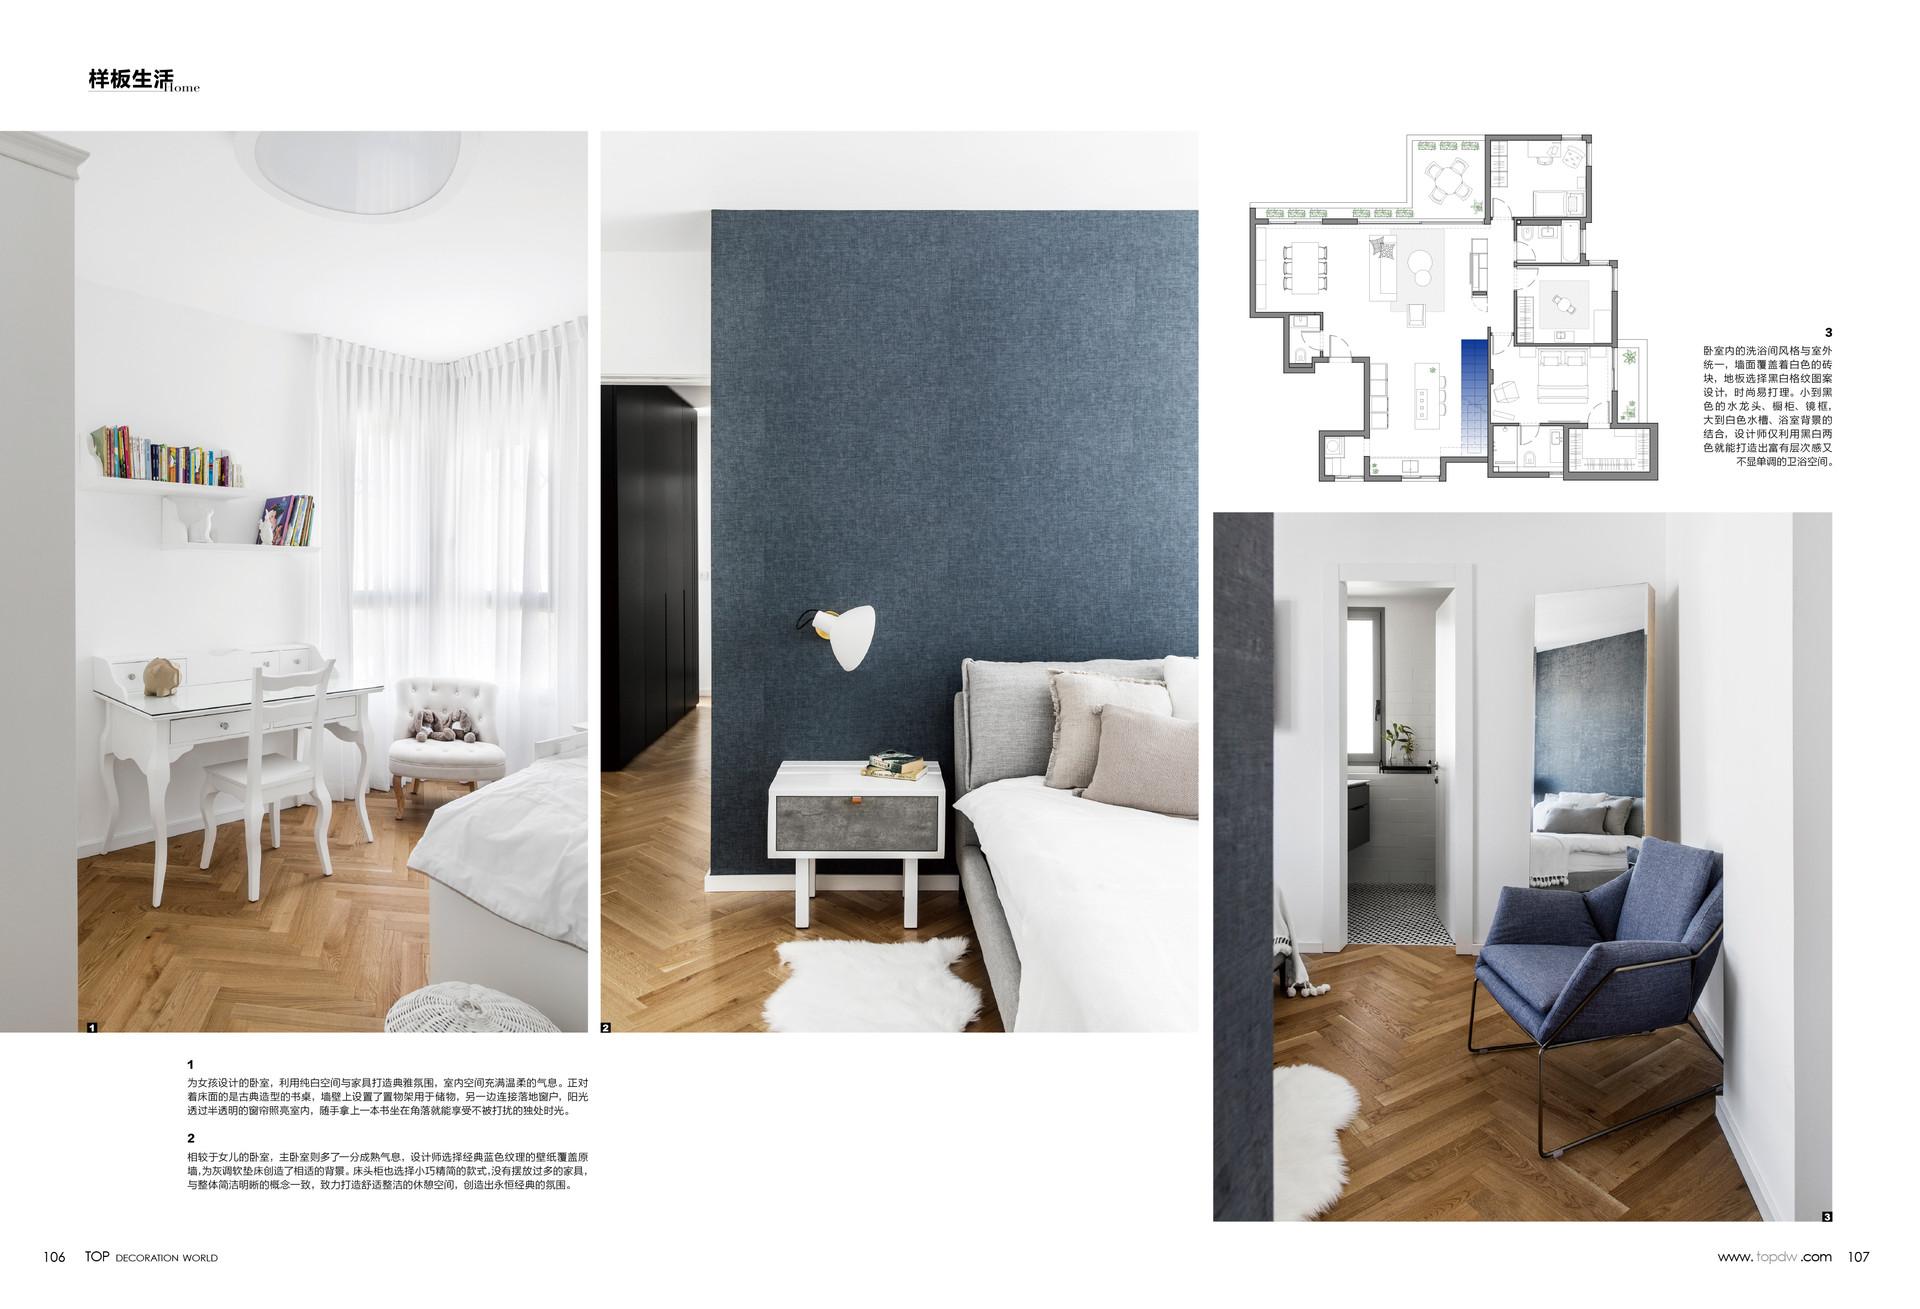 Top Decoration World magazine --April is